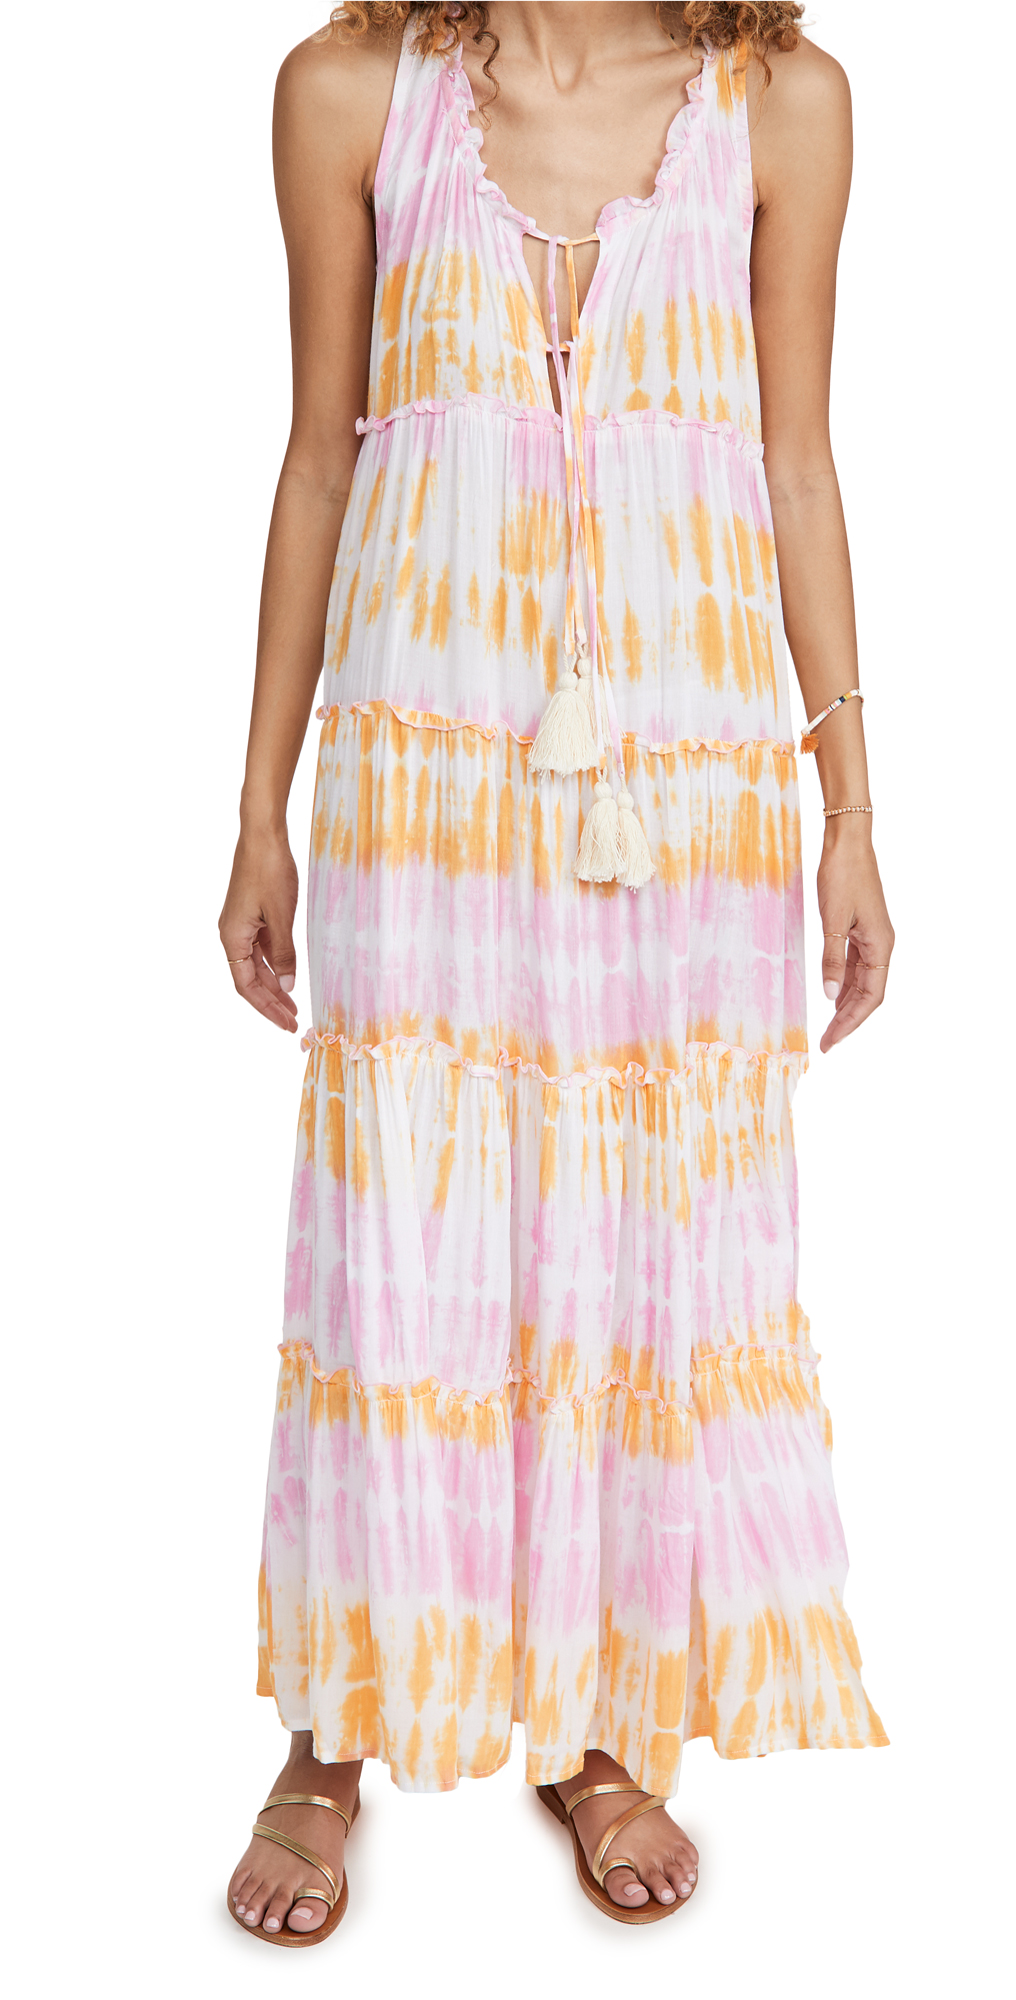 coolchange Everly Tie Dye Dress